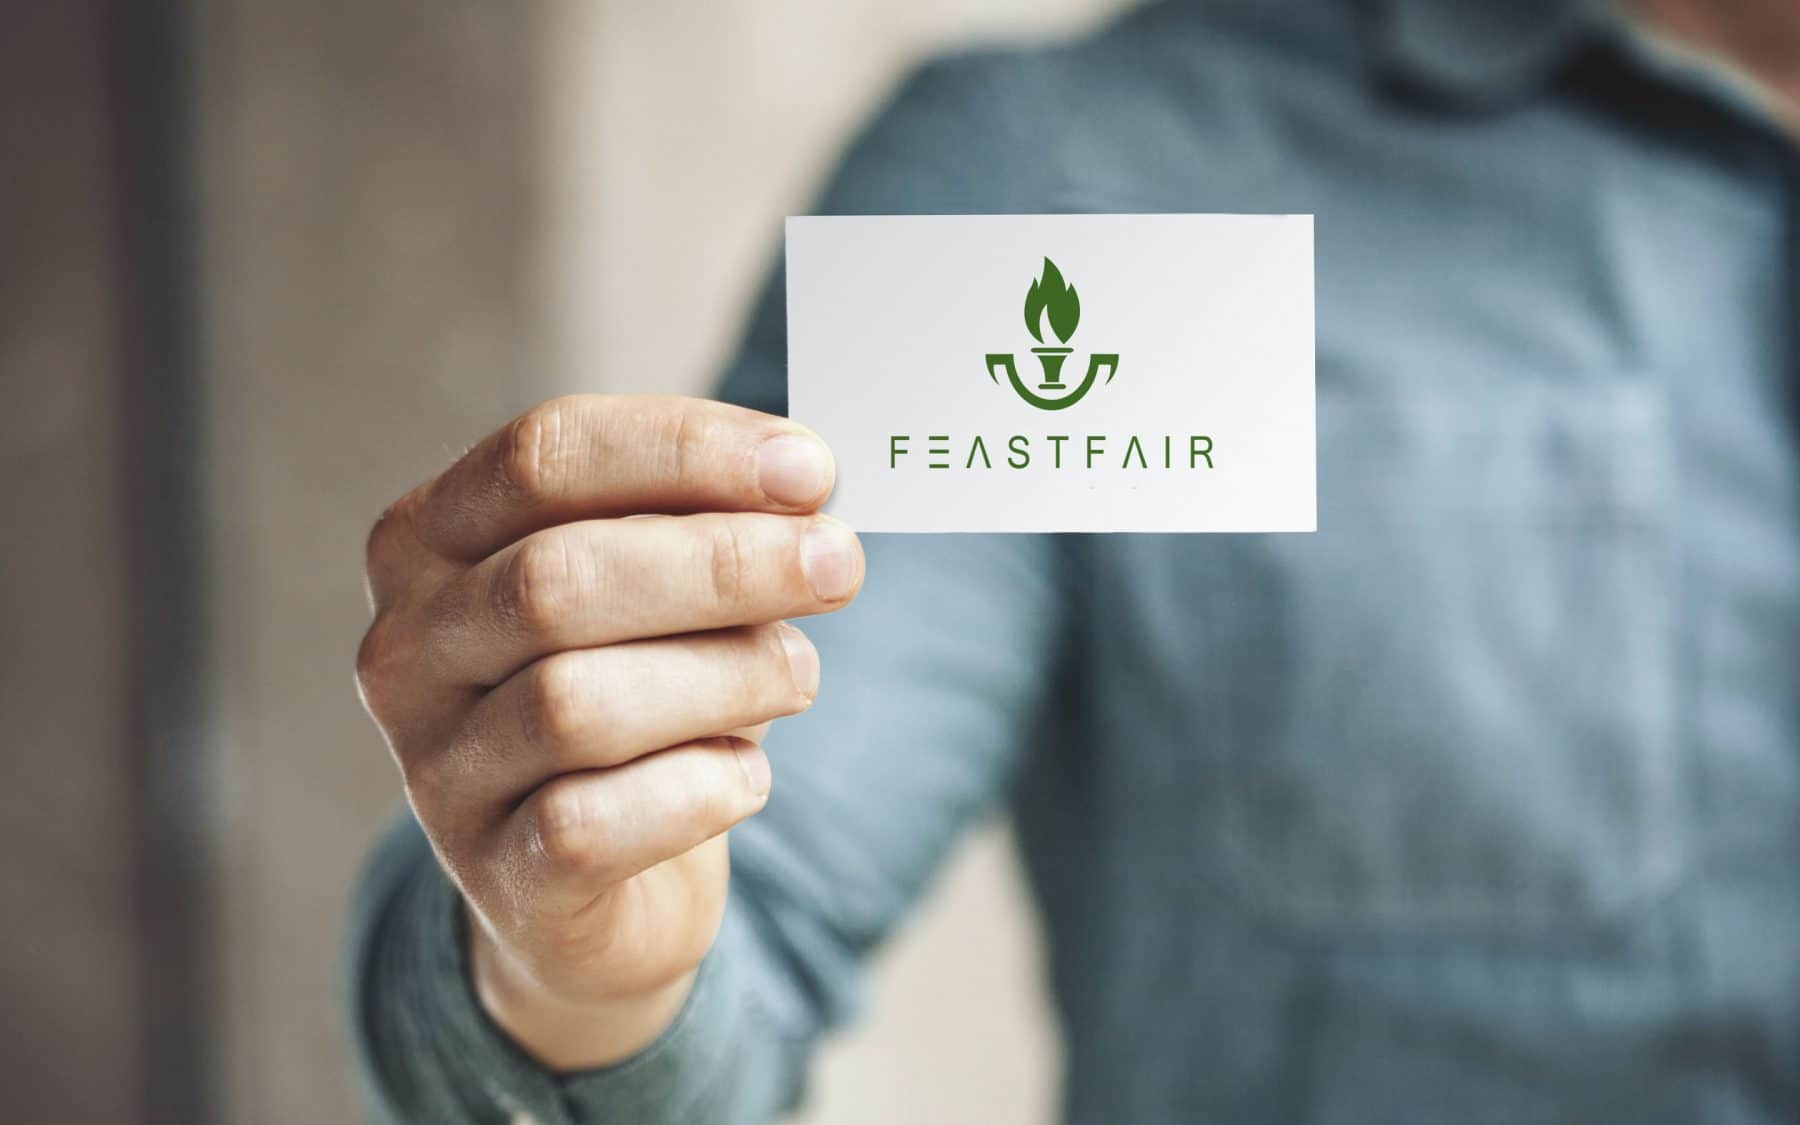 Feastfair 1